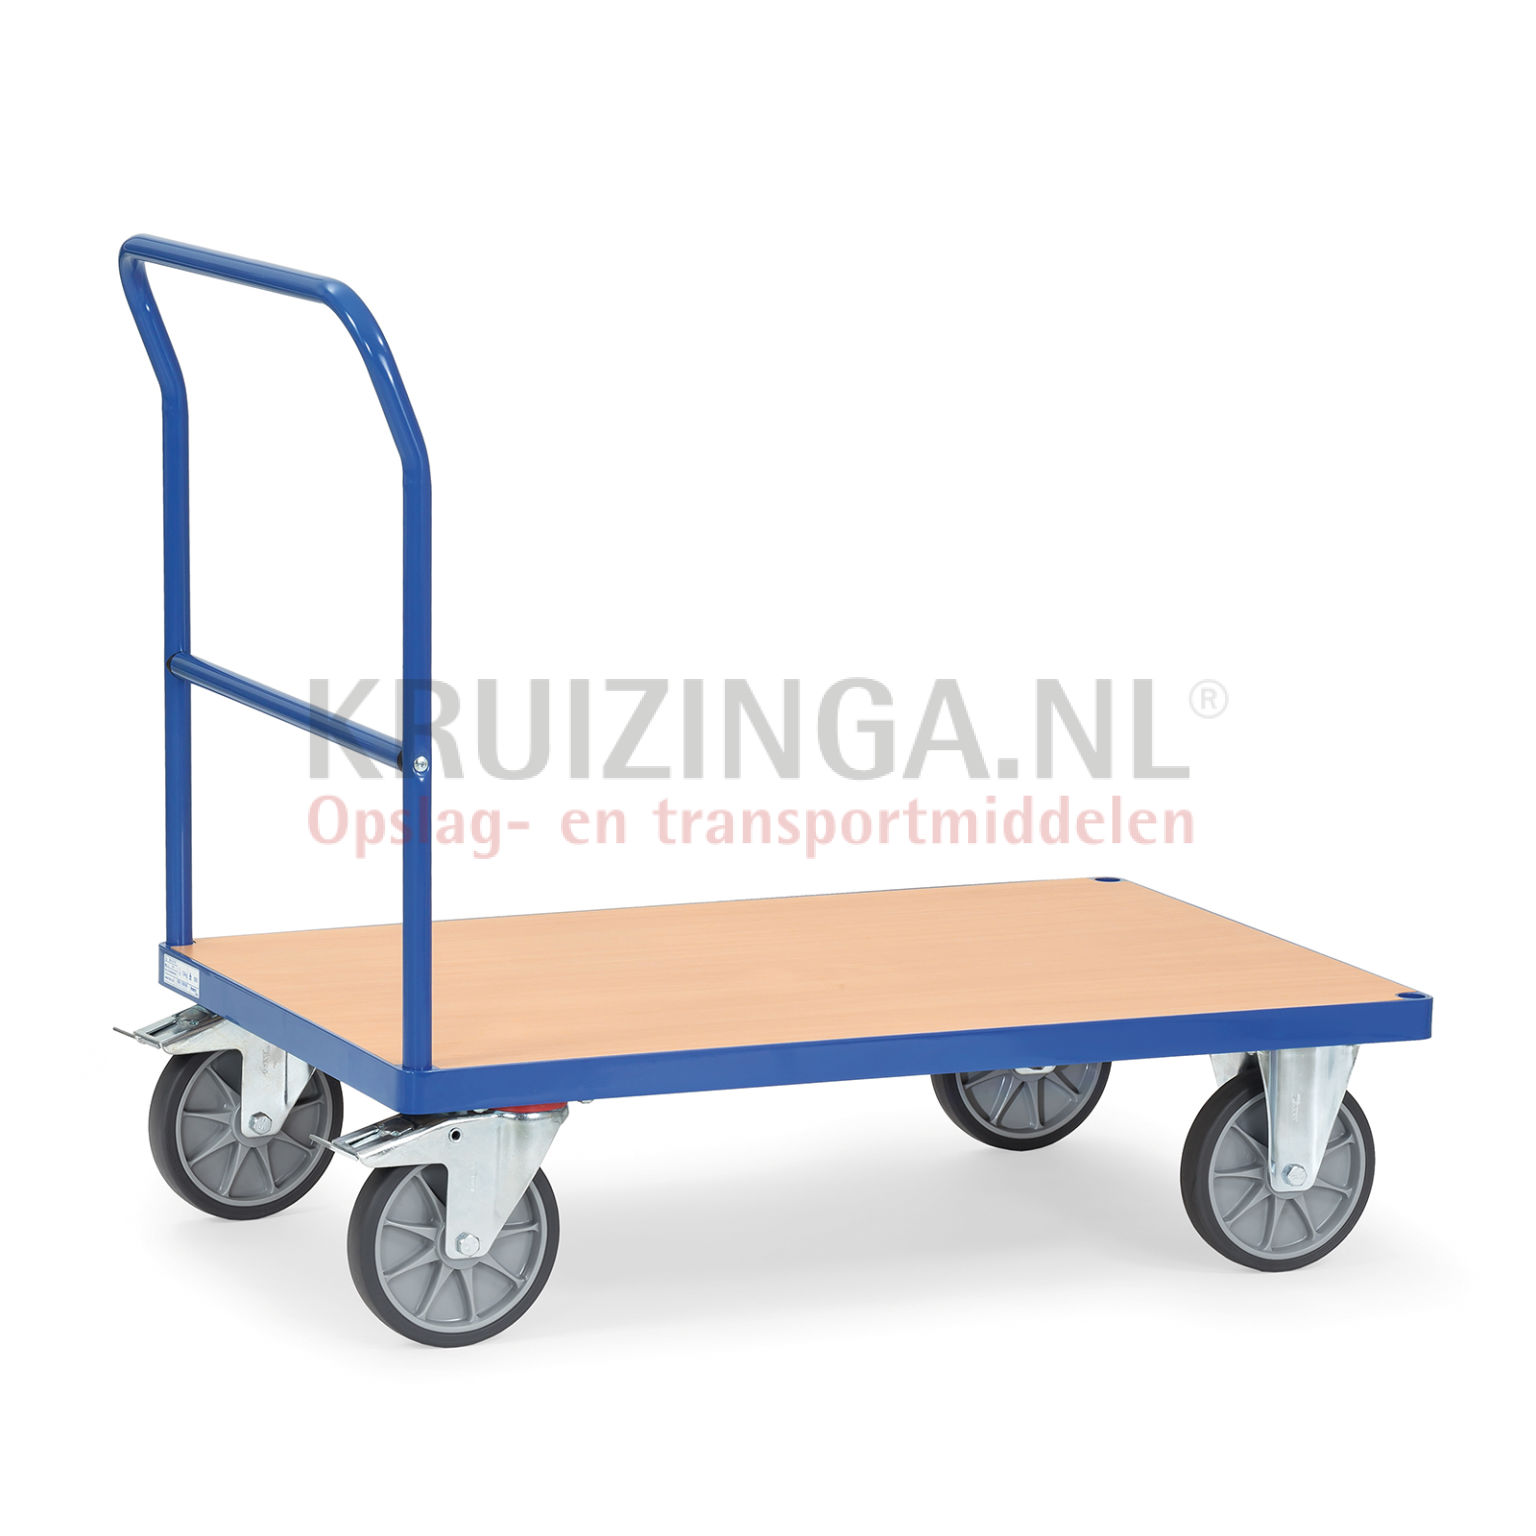 chariots de magasin chariot de manutention chariot plate. Black Bedroom Furniture Sets. Home Design Ideas